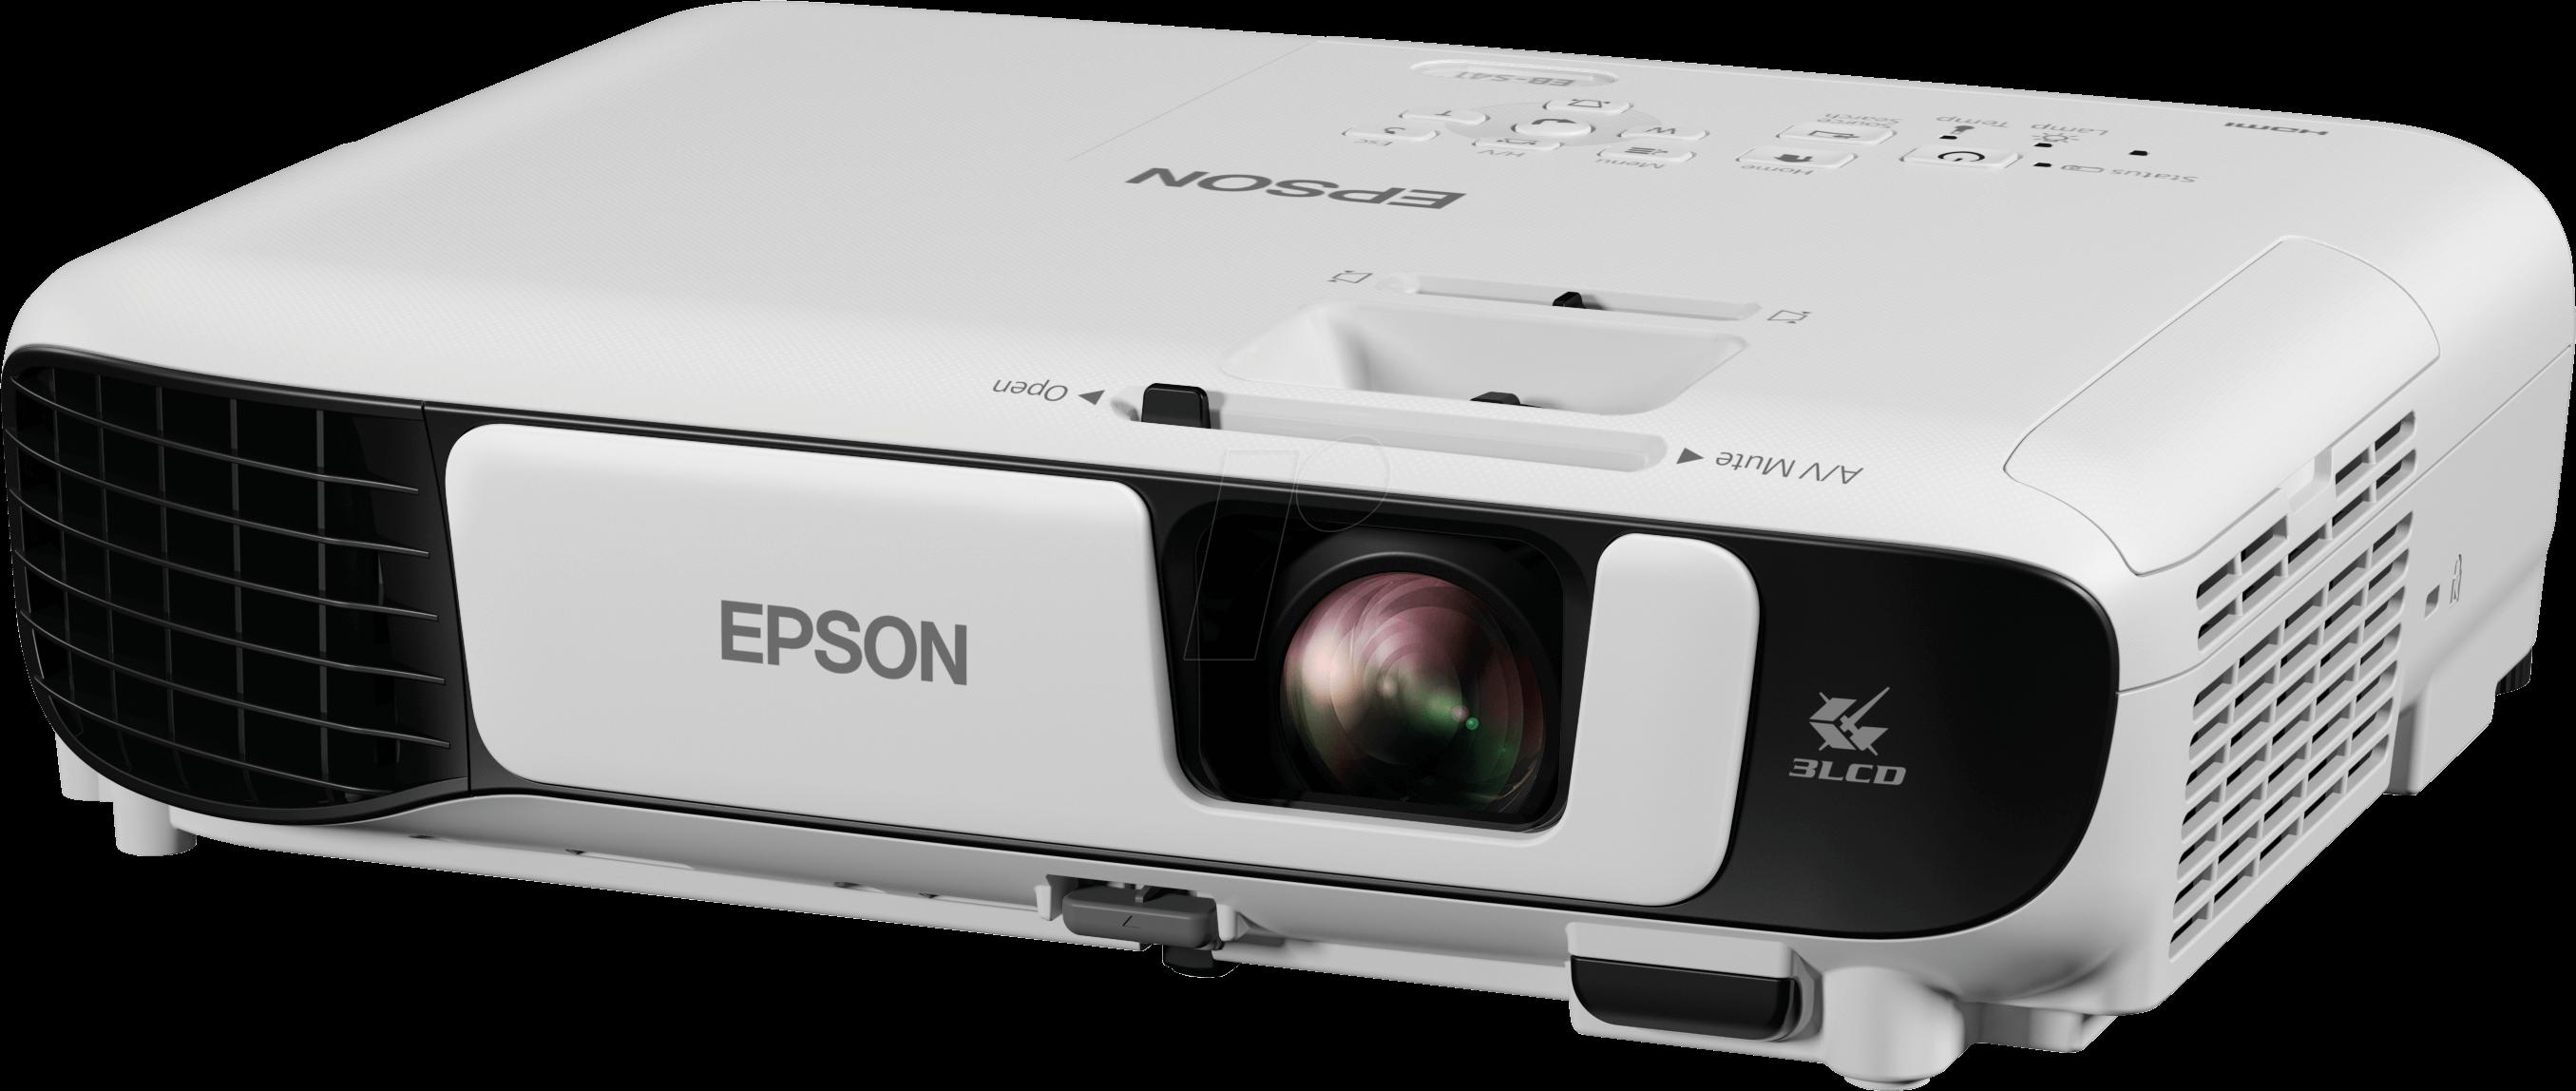 epson eb s41 projektor beamer 3300 lm svga 800 x 600 bei reichelt elektronik. Black Bedroom Furniture Sets. Home Design Ideas